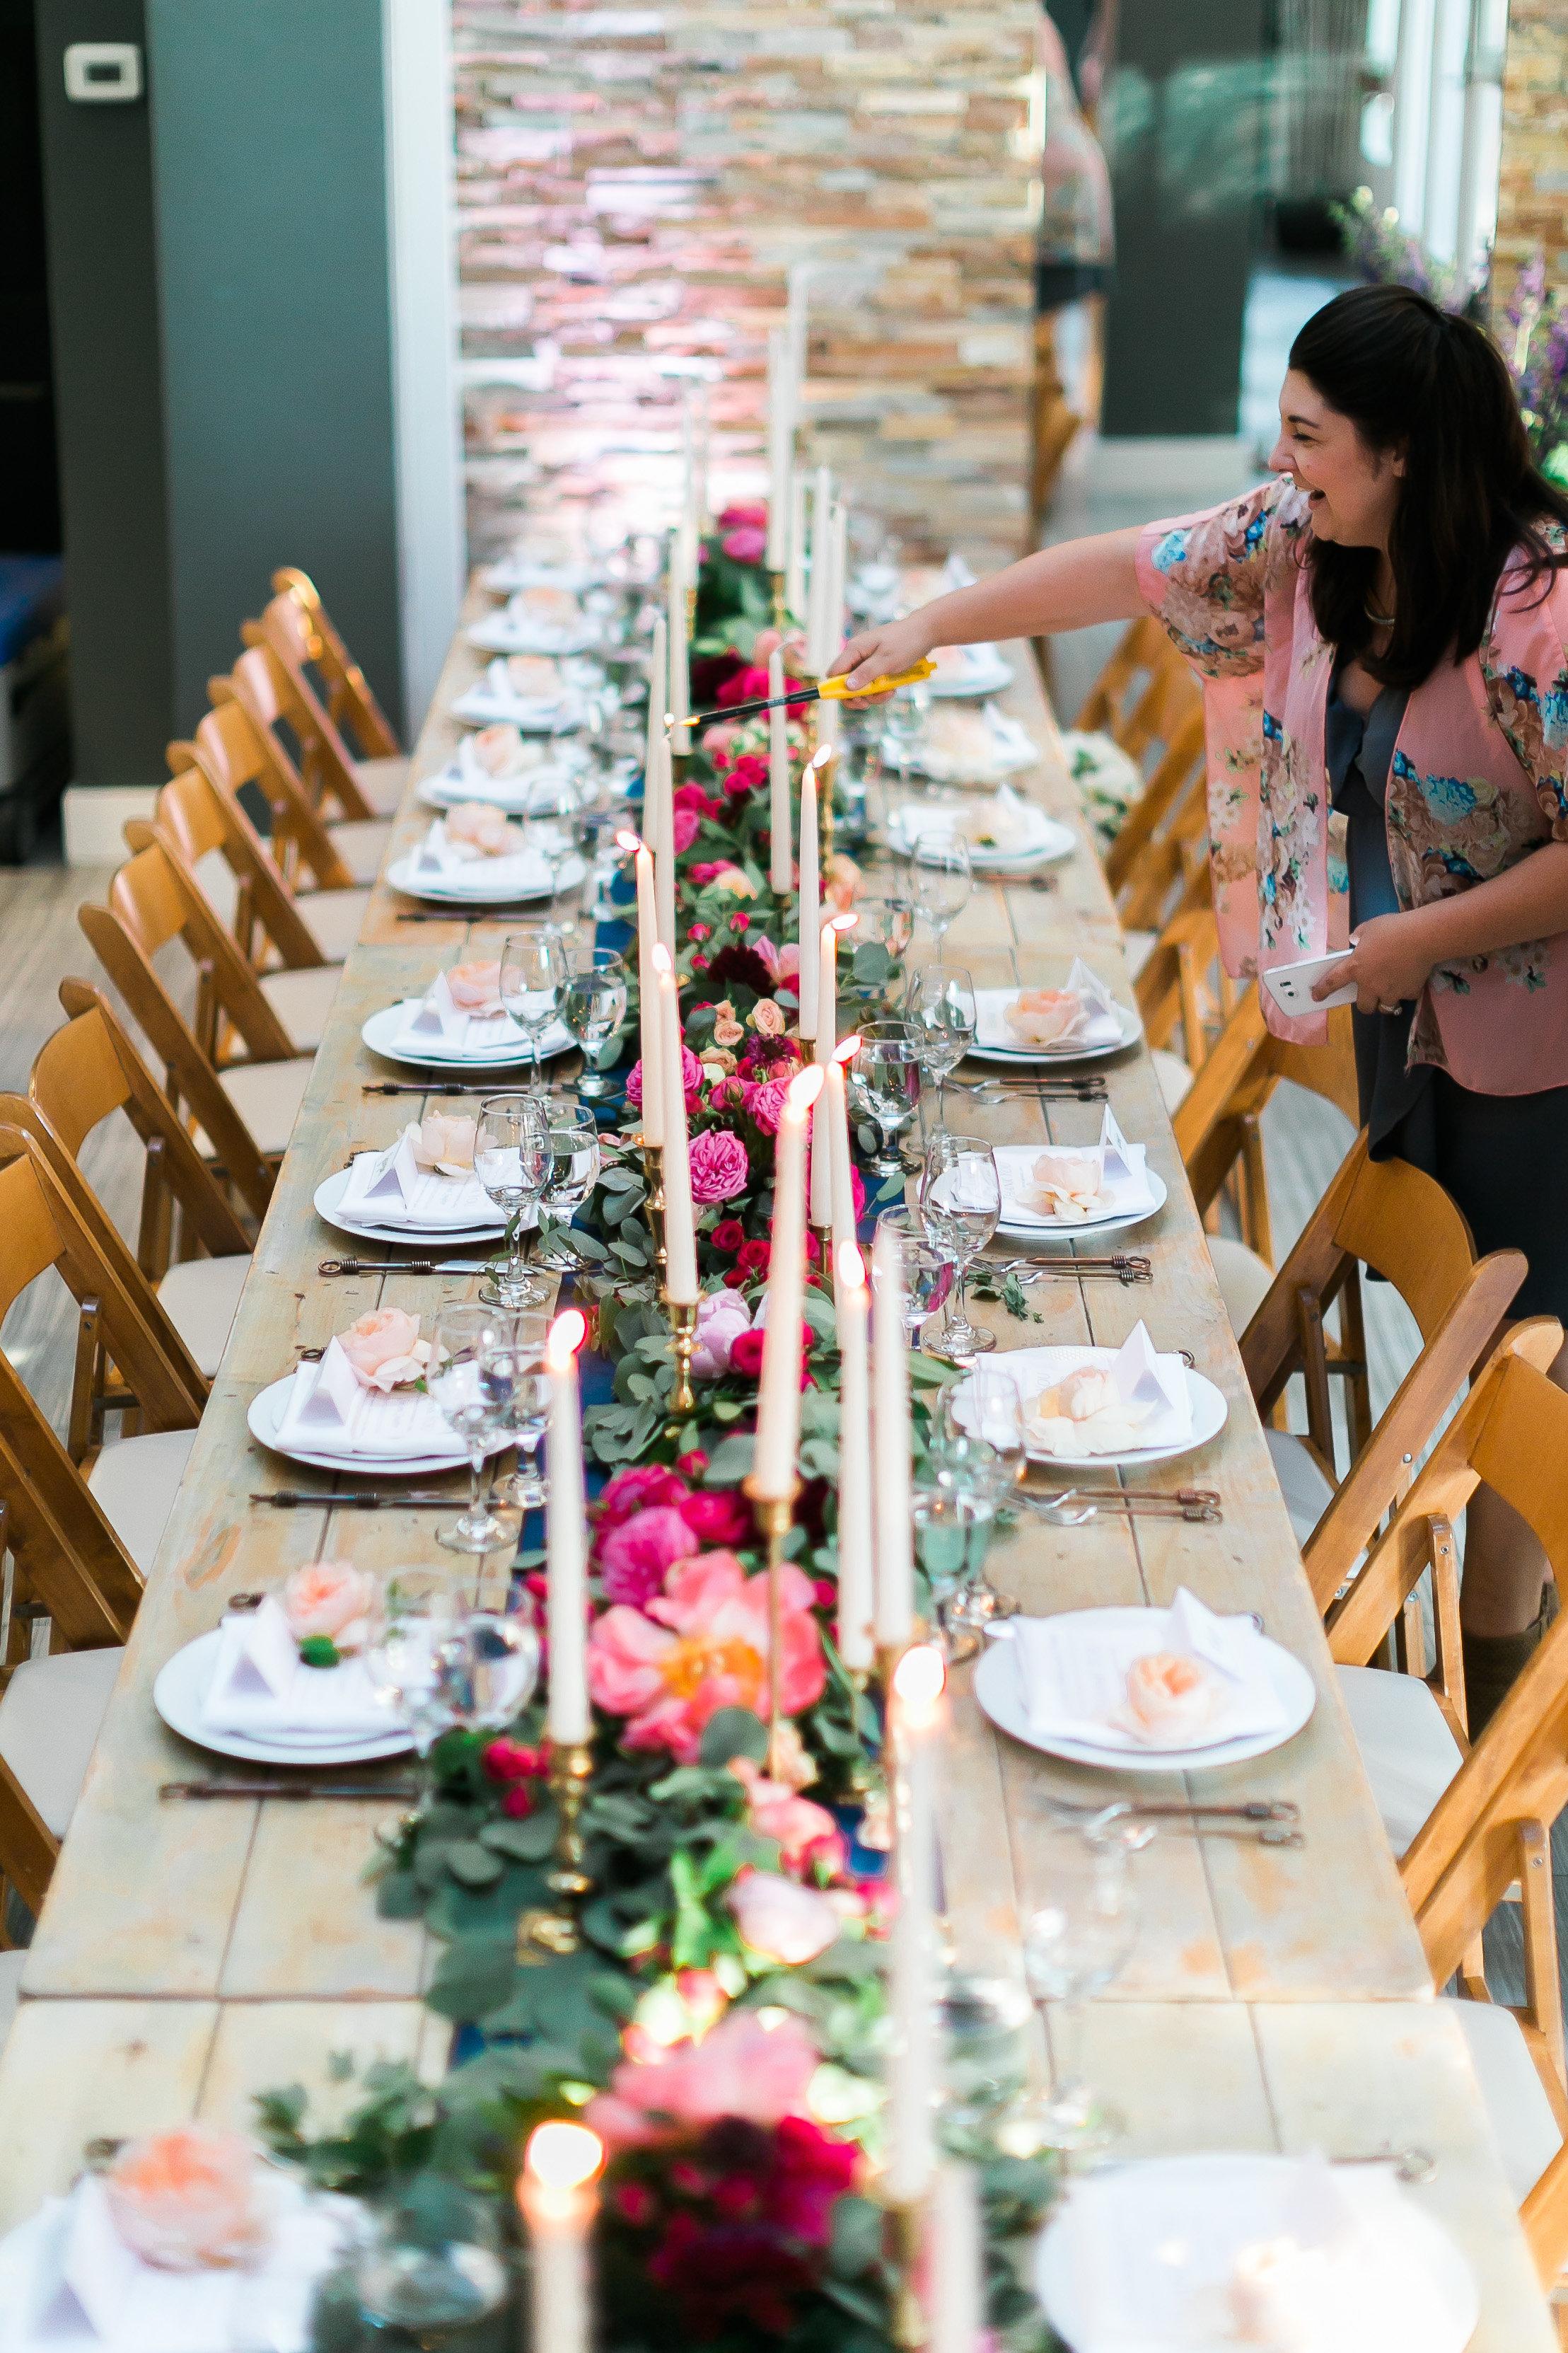 wedding planner, las vegas wedding planner, vegas wedding planner, las vegas wedding coordinator, vegas coordinator, las vegas weddings, vegas wedding, green orchid events